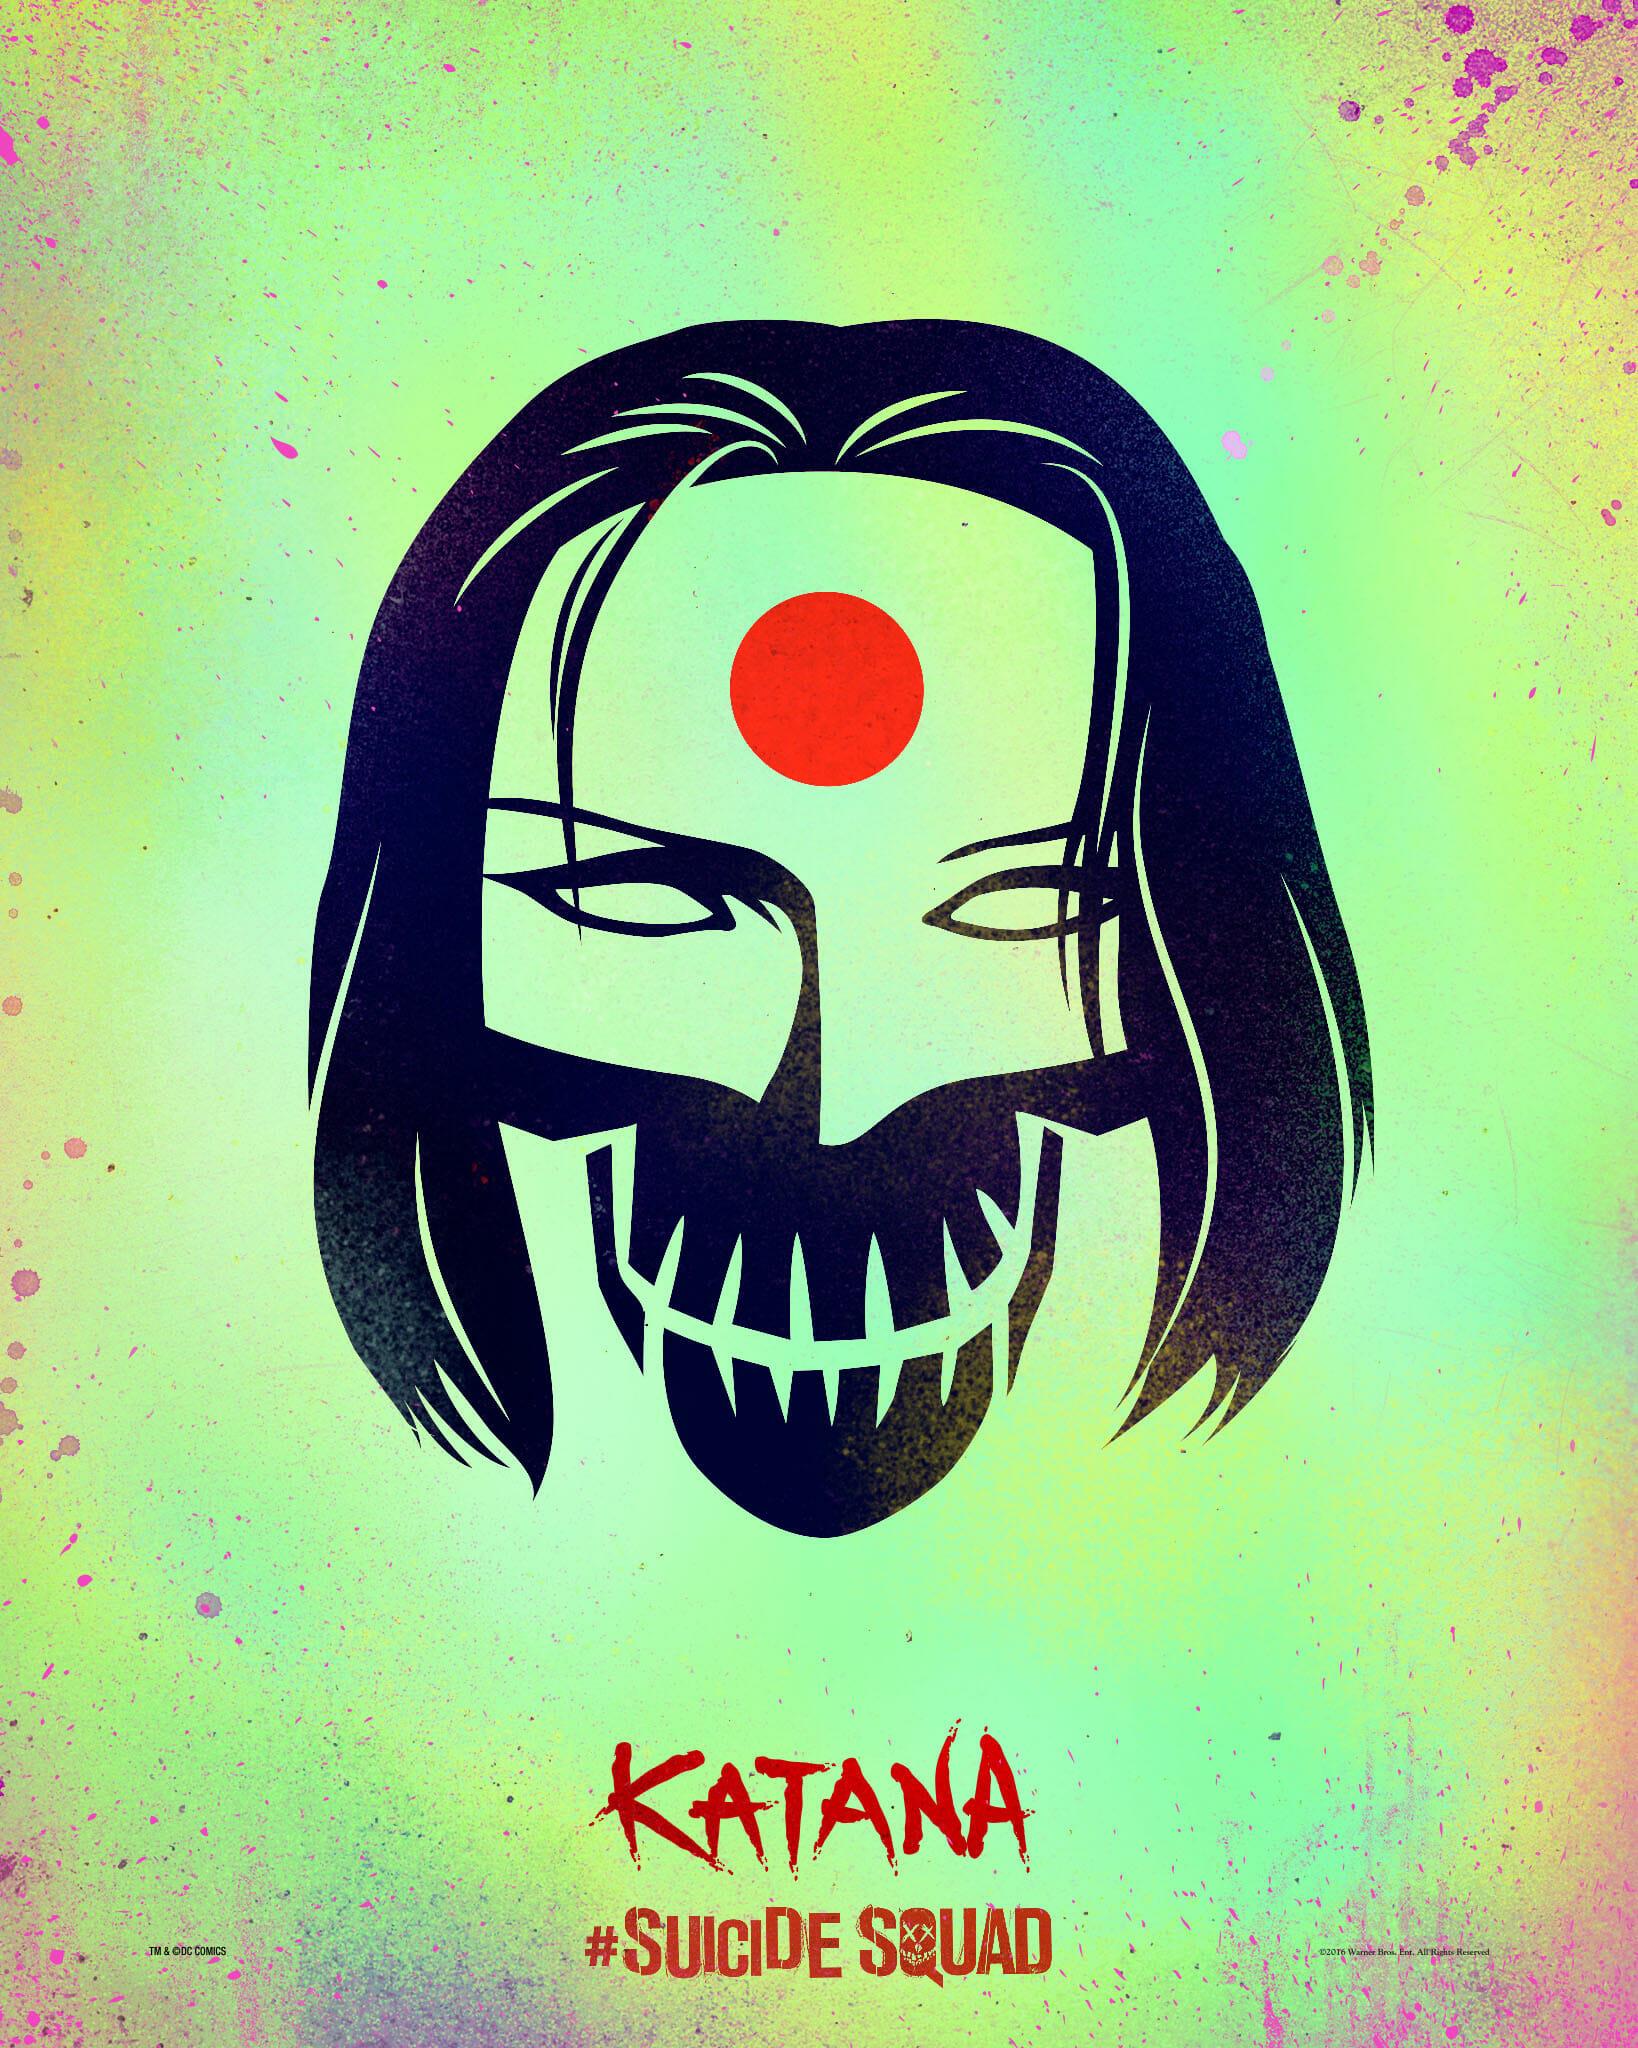 SUISQ_Skull_Katana_Instagram_1638x2048_master